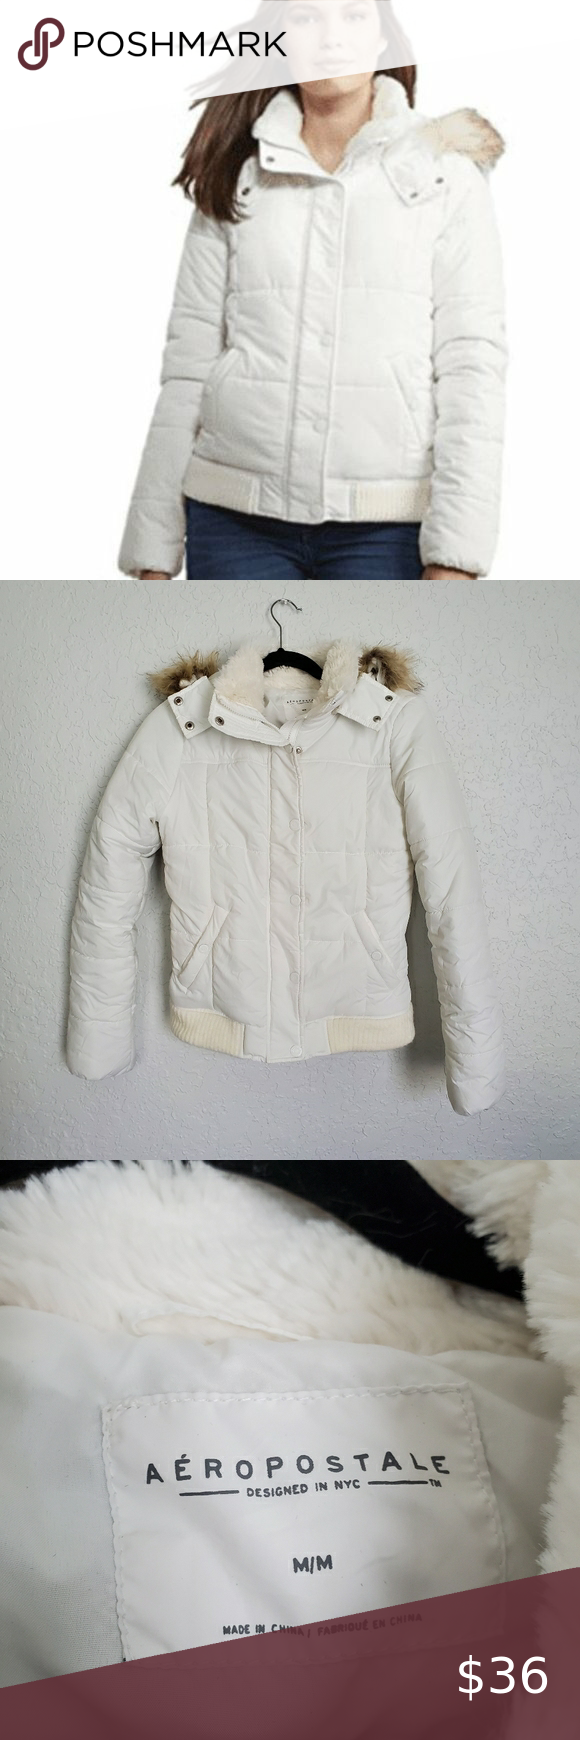 Aeropostal White Hooded Puffer Jacket Medium White Puffer Jacket Clothes Design Jackets [ 1740 x 580 Pixel ]